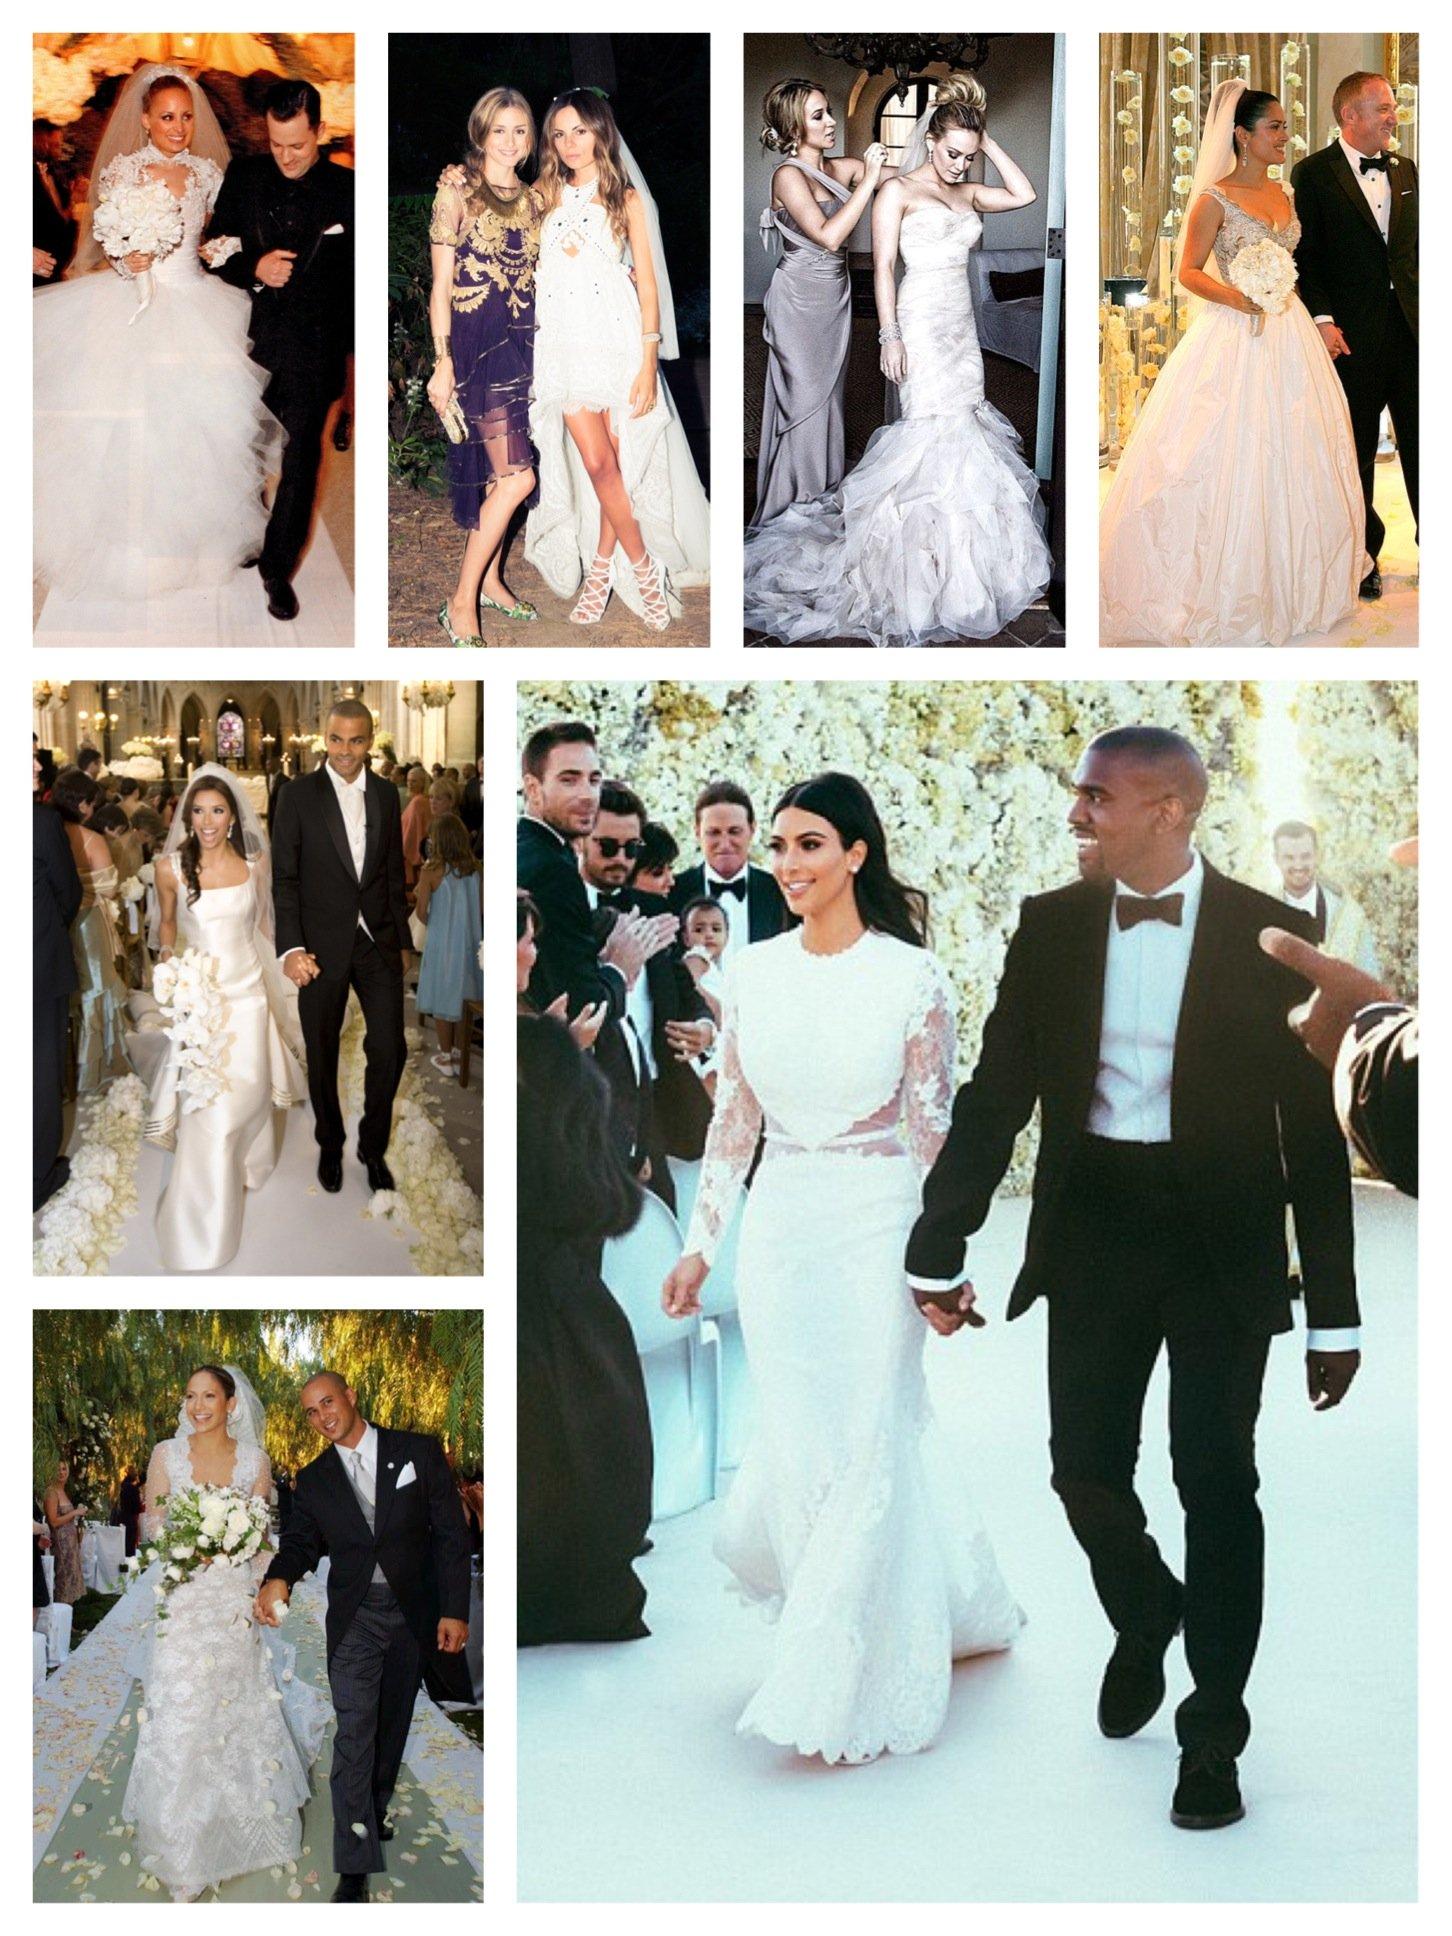 petite wedding dresses uk us petite wedding dress Petite celebrity wedding dresses